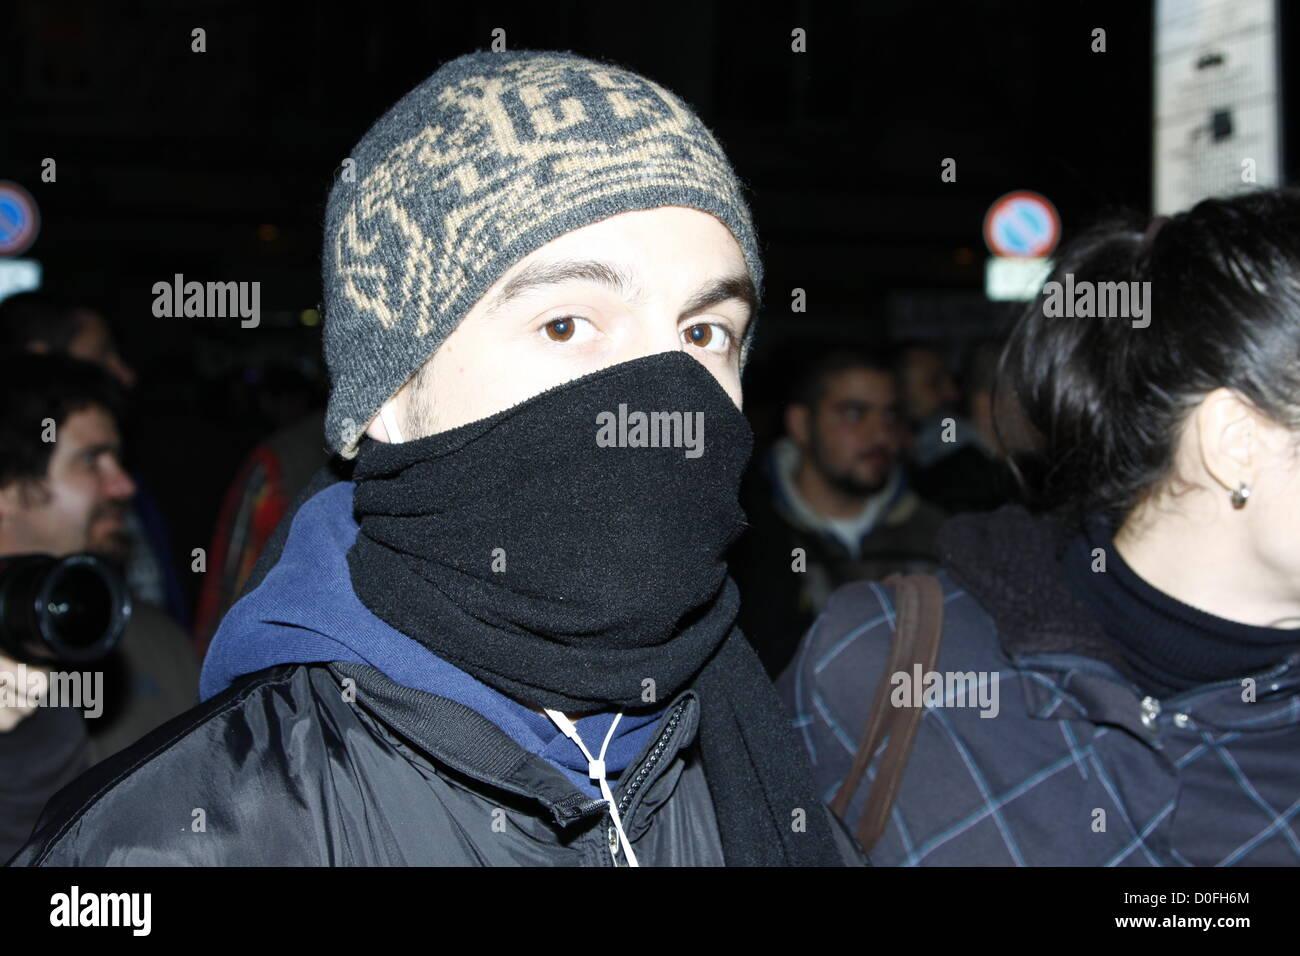 Sofia, Bulgaria; 24th November, 2012. Masked demonstrator during the demonstration of the group 'Tomato Revolution' - Stock Image